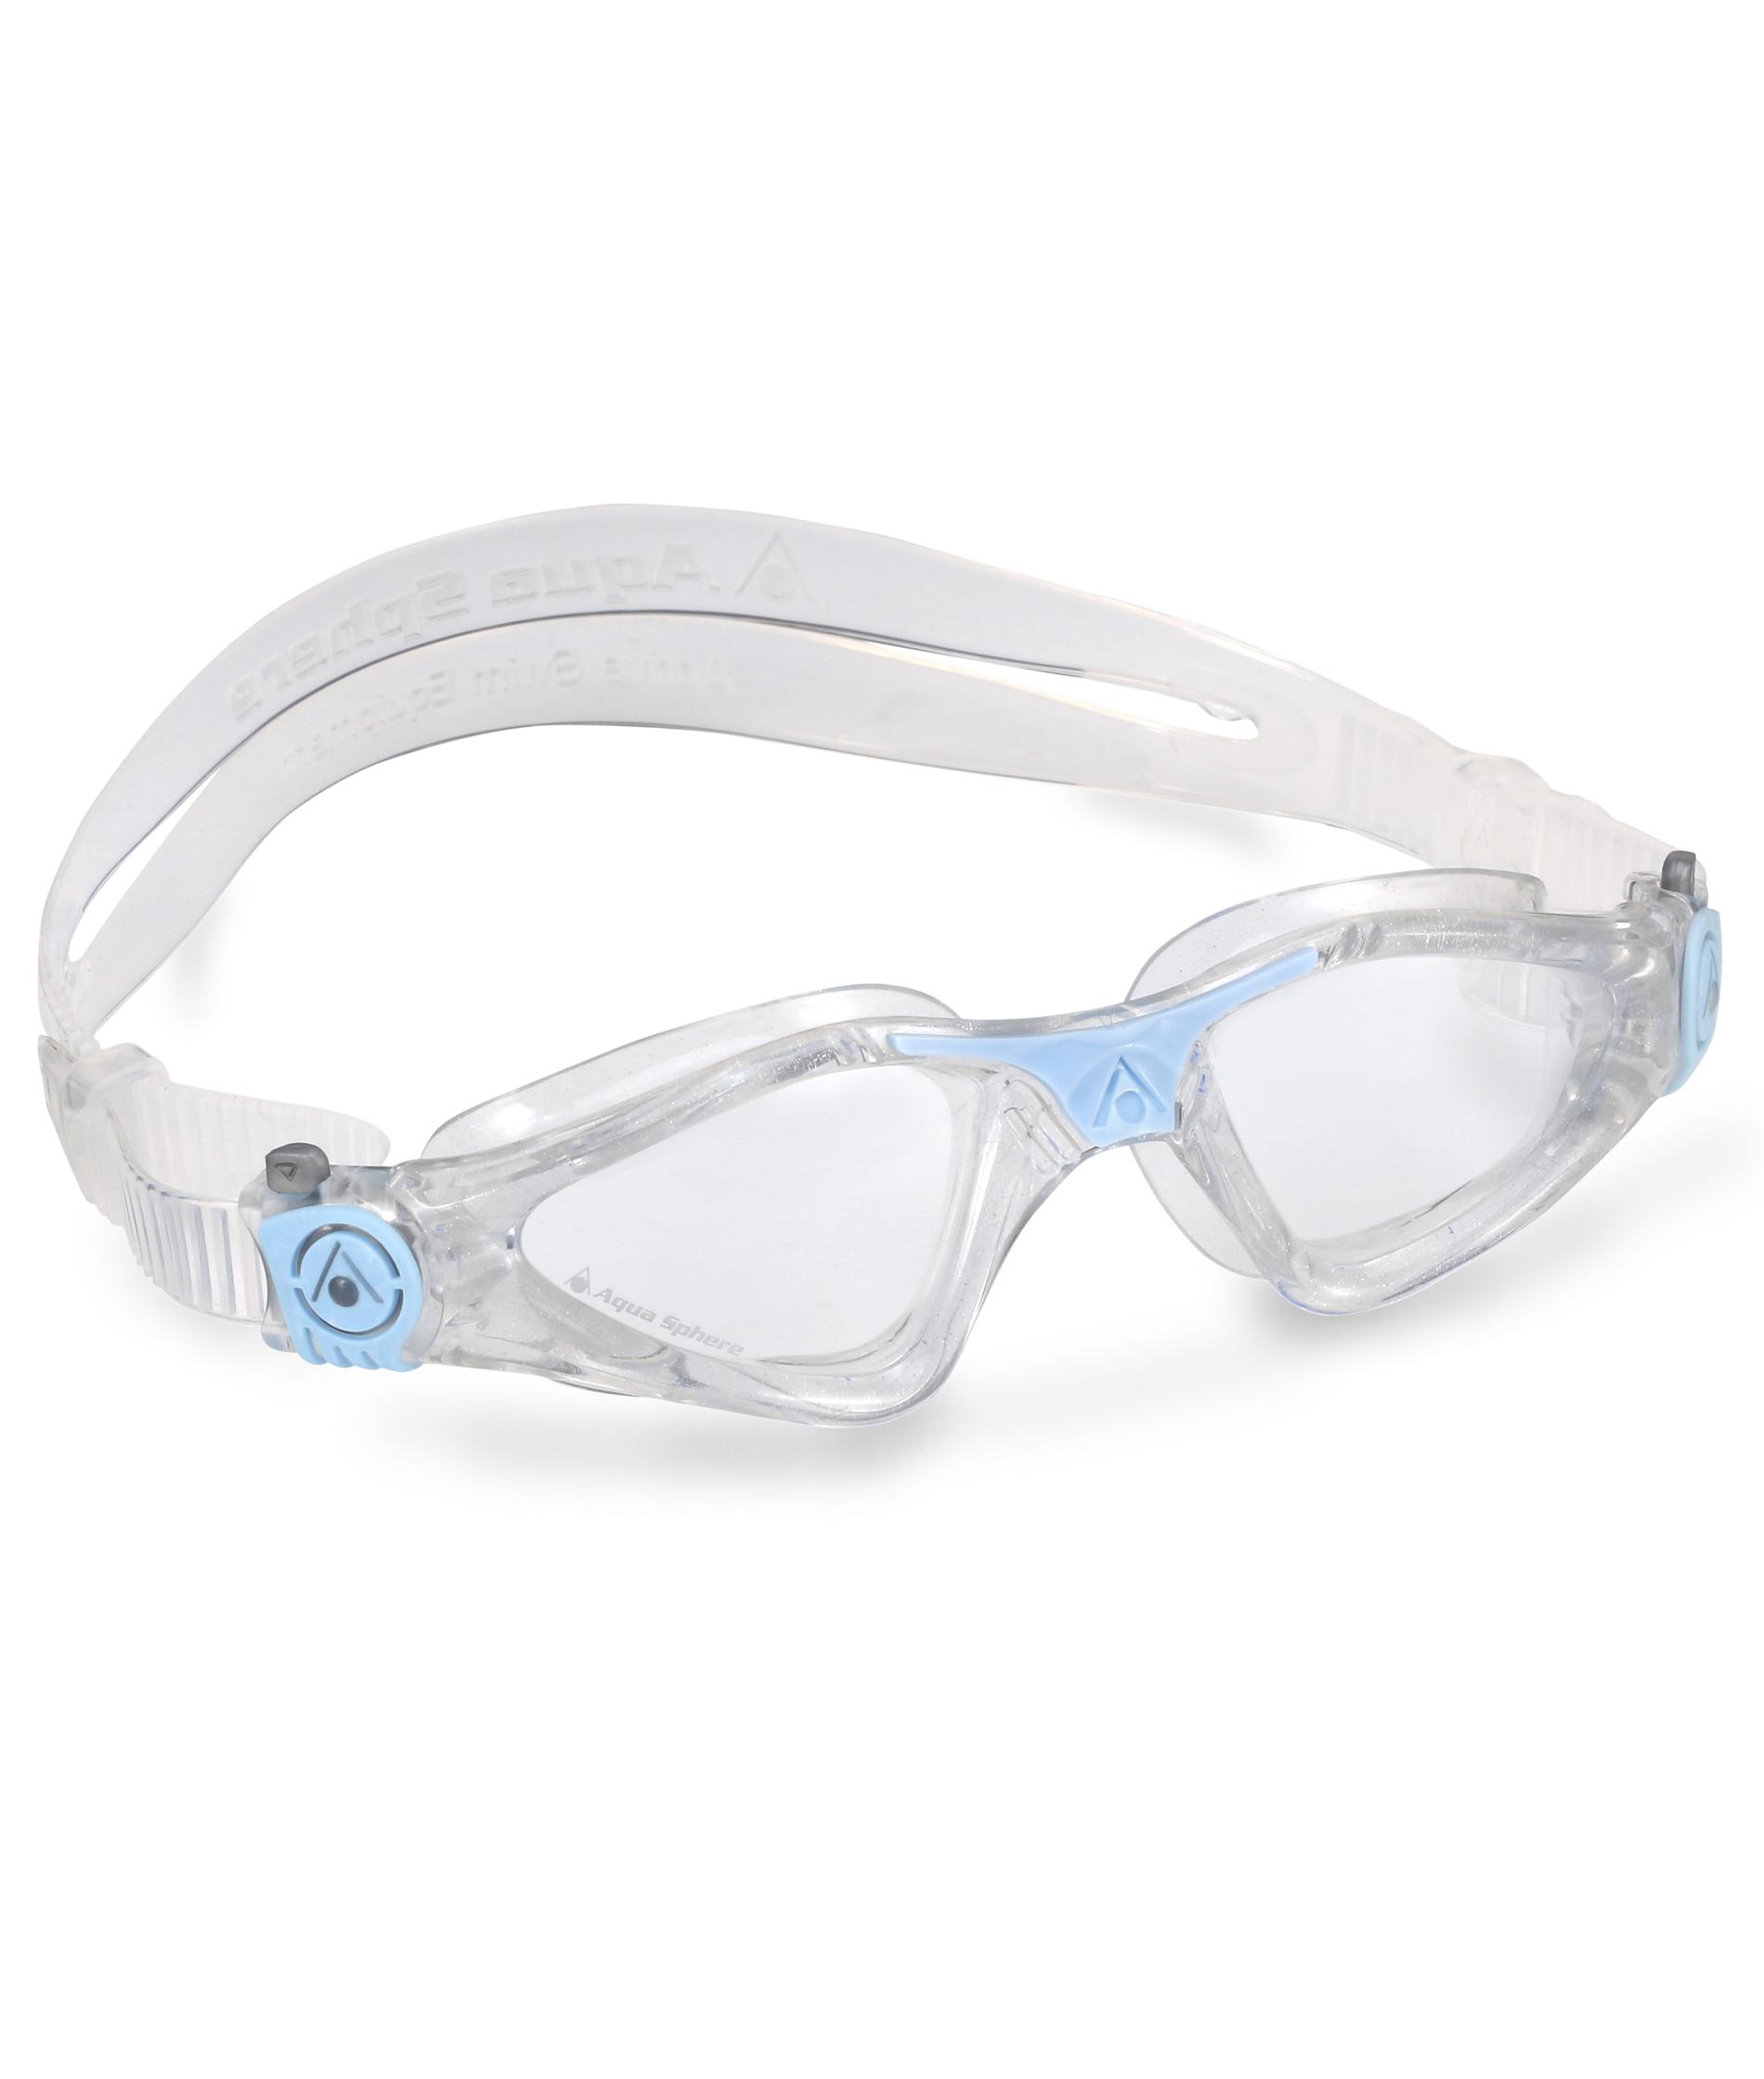 Aqua Sphere Ladies Kayenne Goggle - Blue/Clear Lens